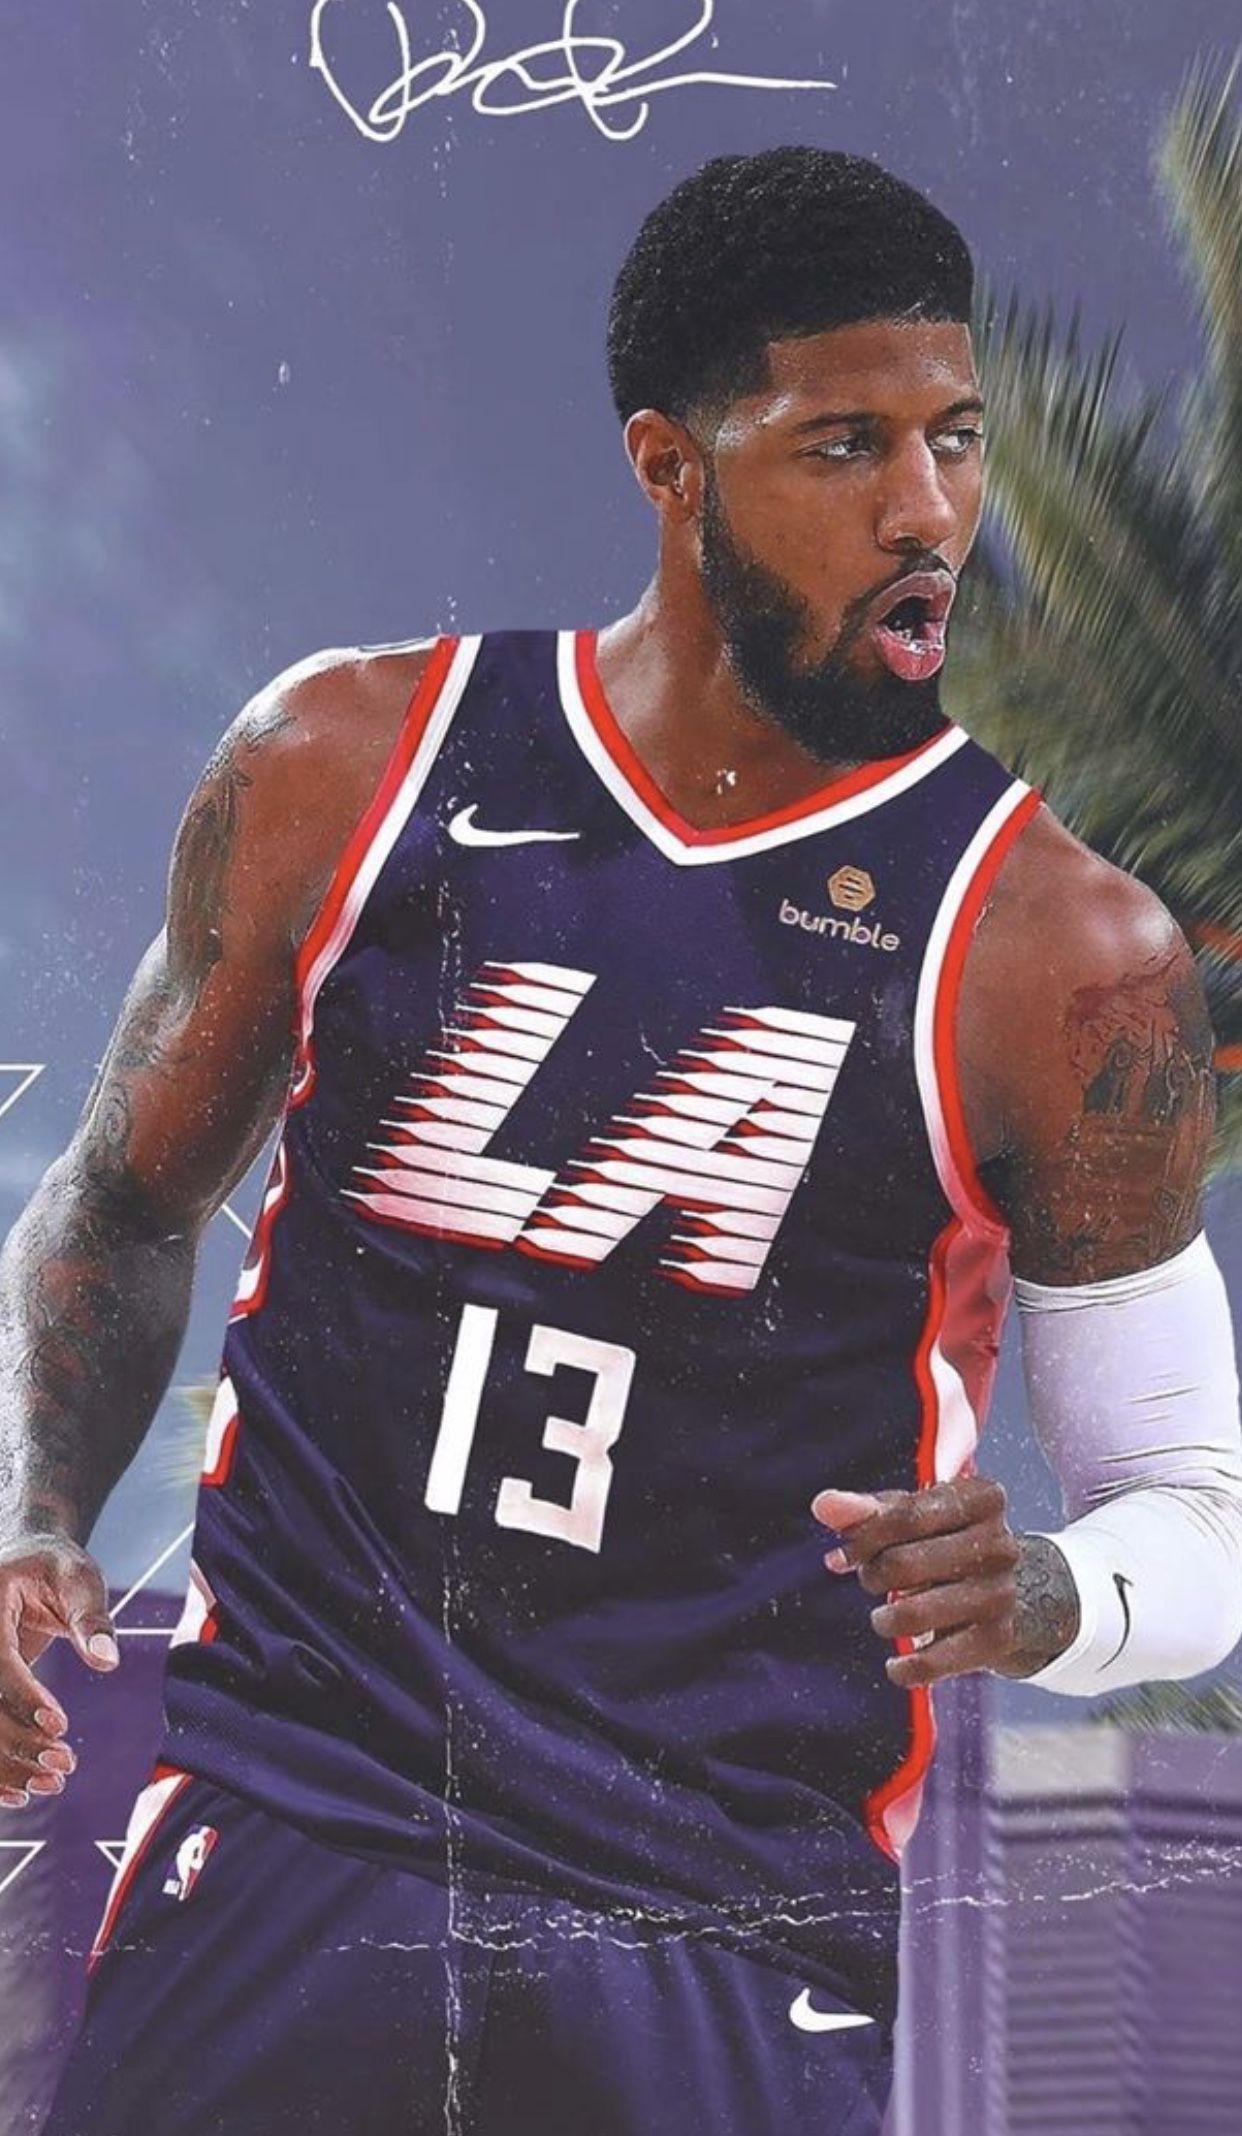 Pg13 Paul George La Clippers Wallpaper 2019 Basketball Players Nba Nba Pictures Nba Basketball Art